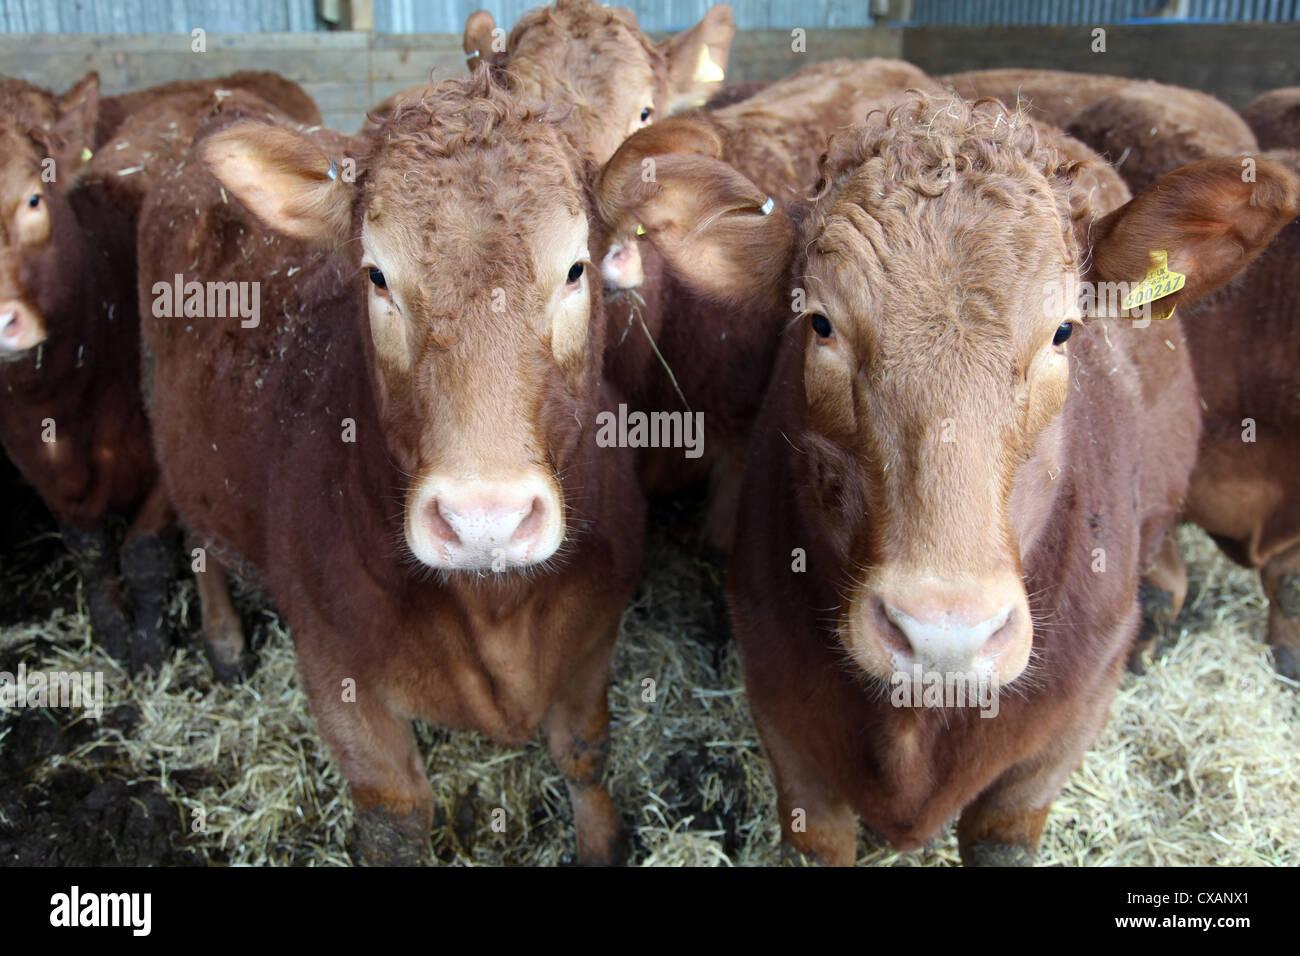 Pedigree South Devon cattle, Devon, England, United Kingdom, Europe - Stock Image